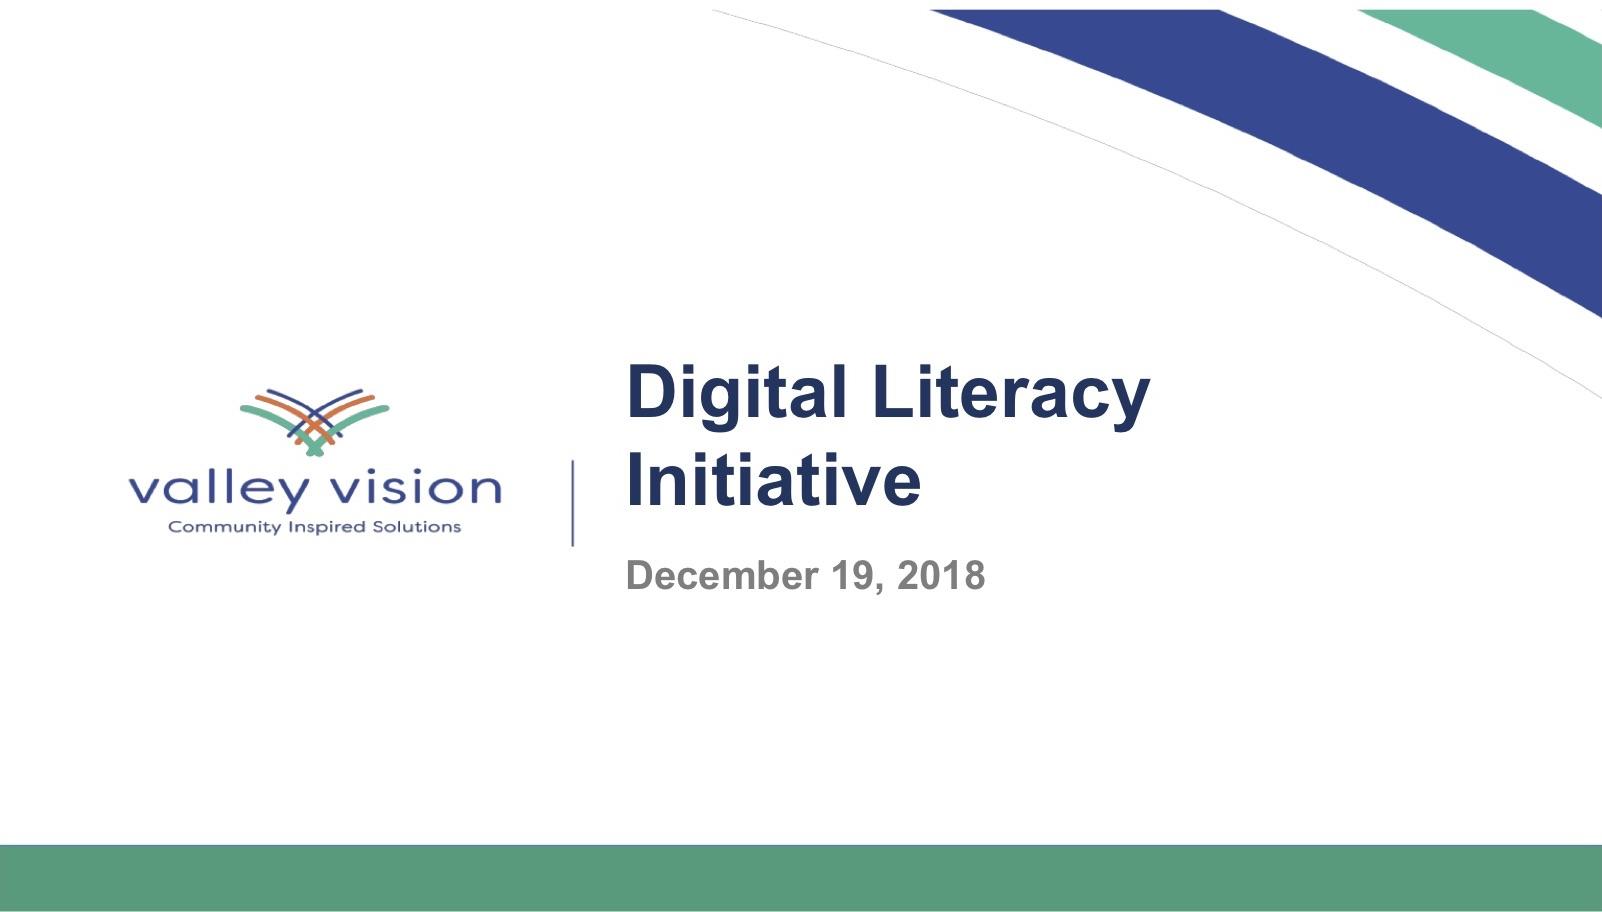 Digital Literacy Initiative goals and metrics framework.jpg